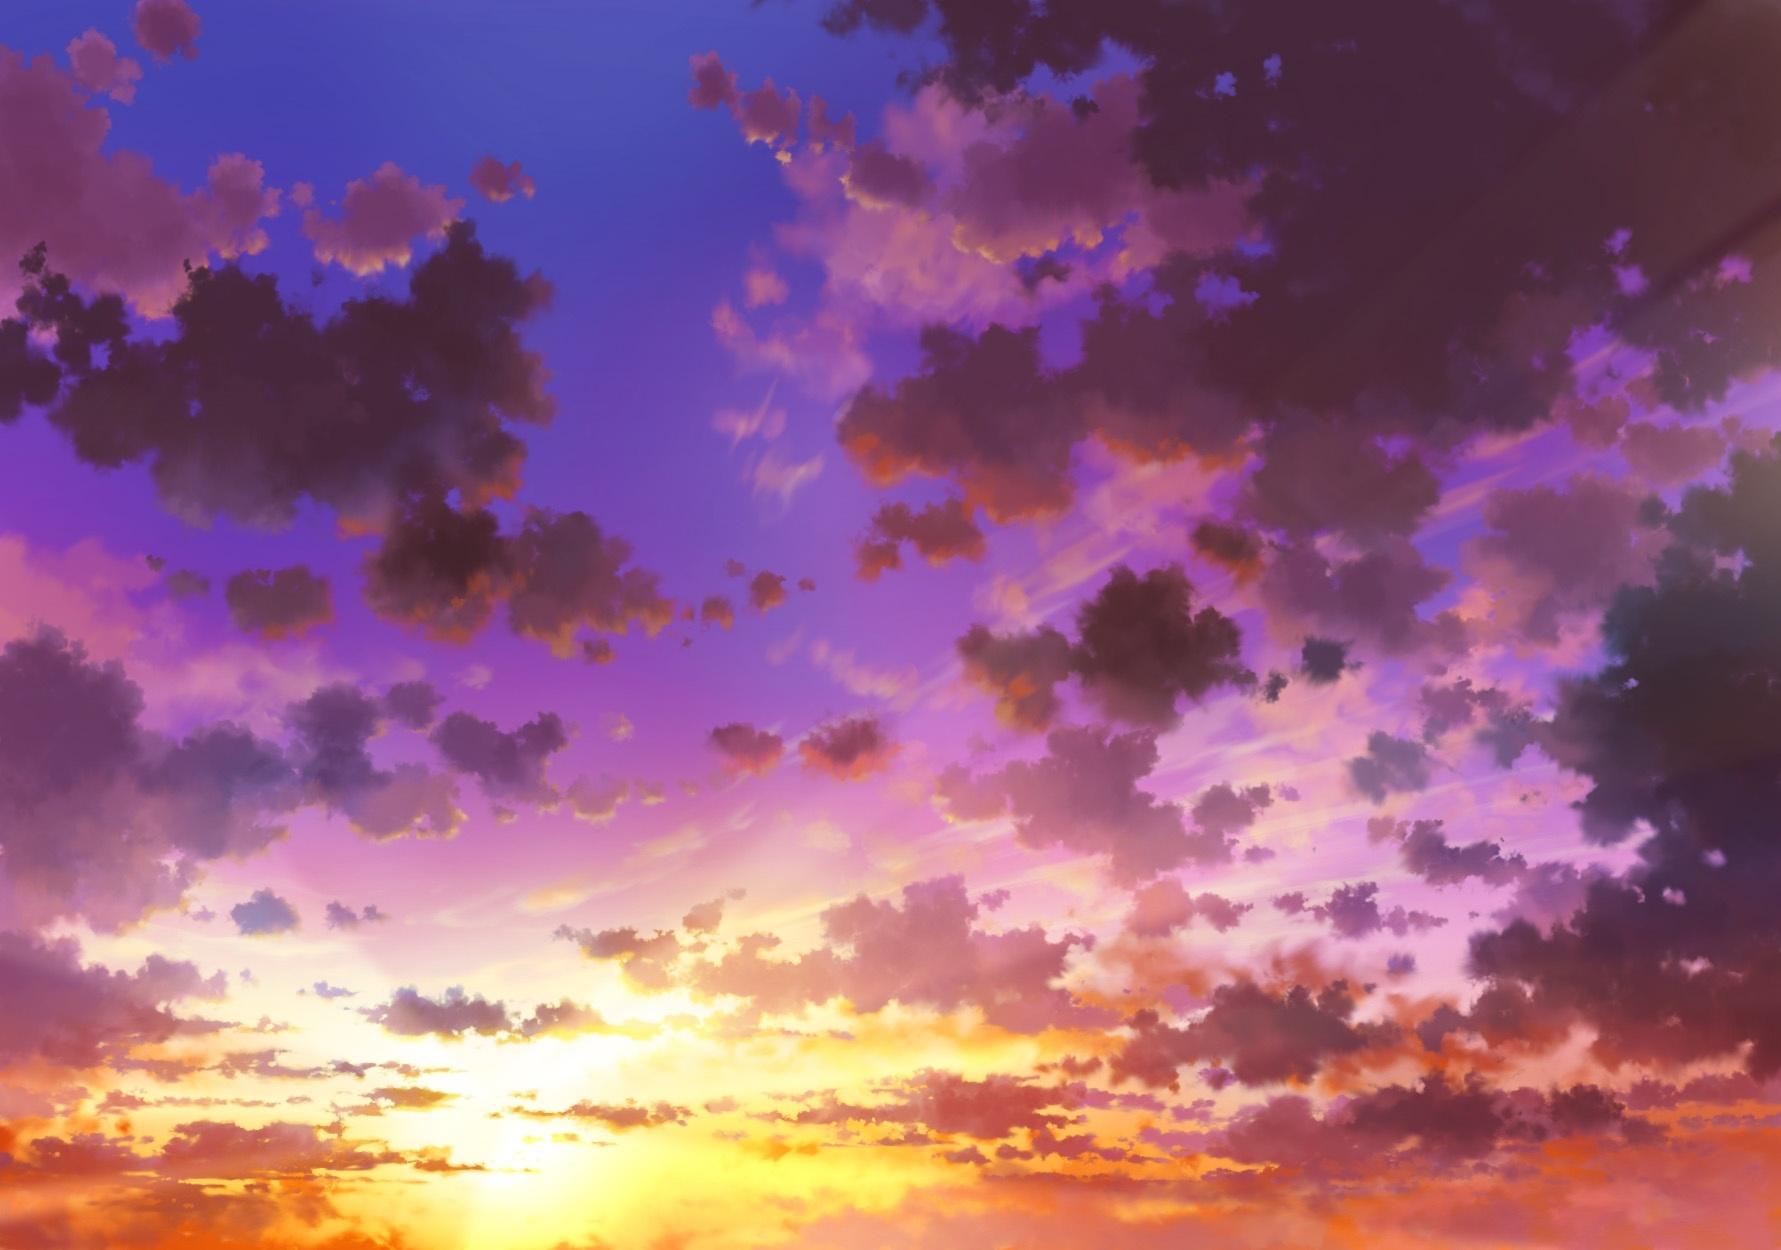 Anime Sky Sunset Clouds wallpaper | 1781x1250 | 1079265 ...